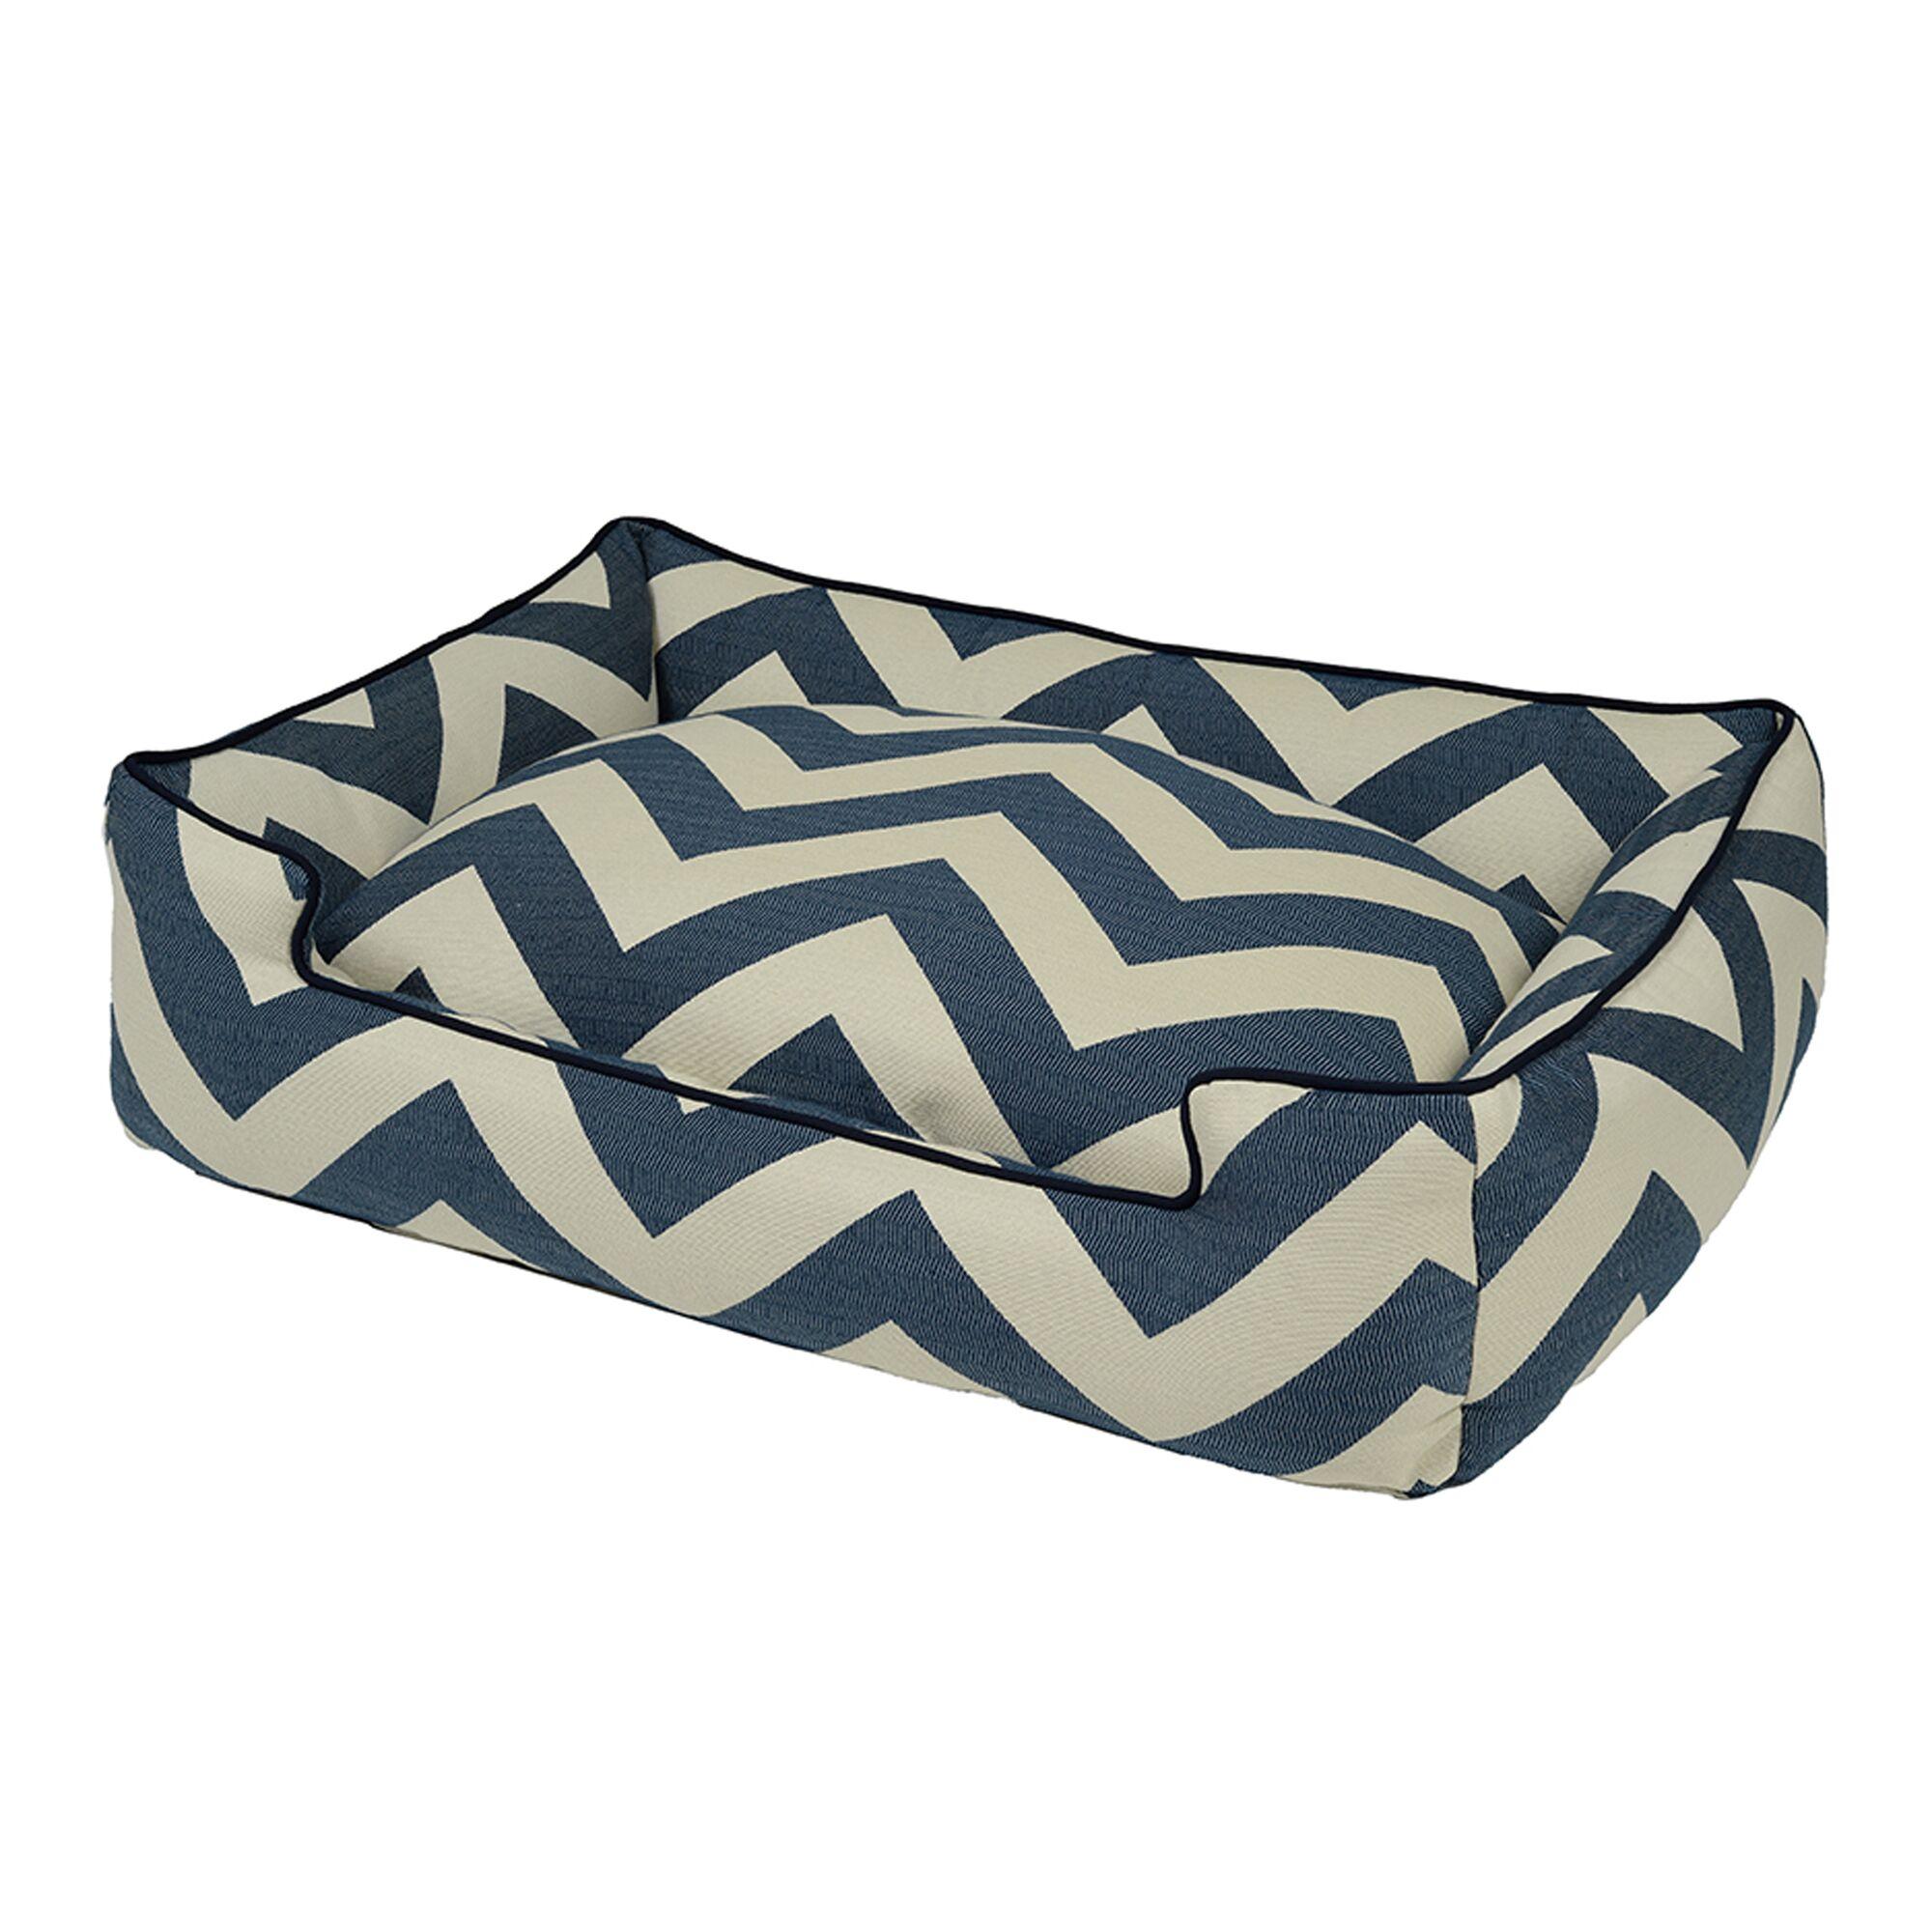 Spellbound Premium Cotton Blend Lounge Bolster Dog Bed Color: Blue, Size: Extra Large - 48